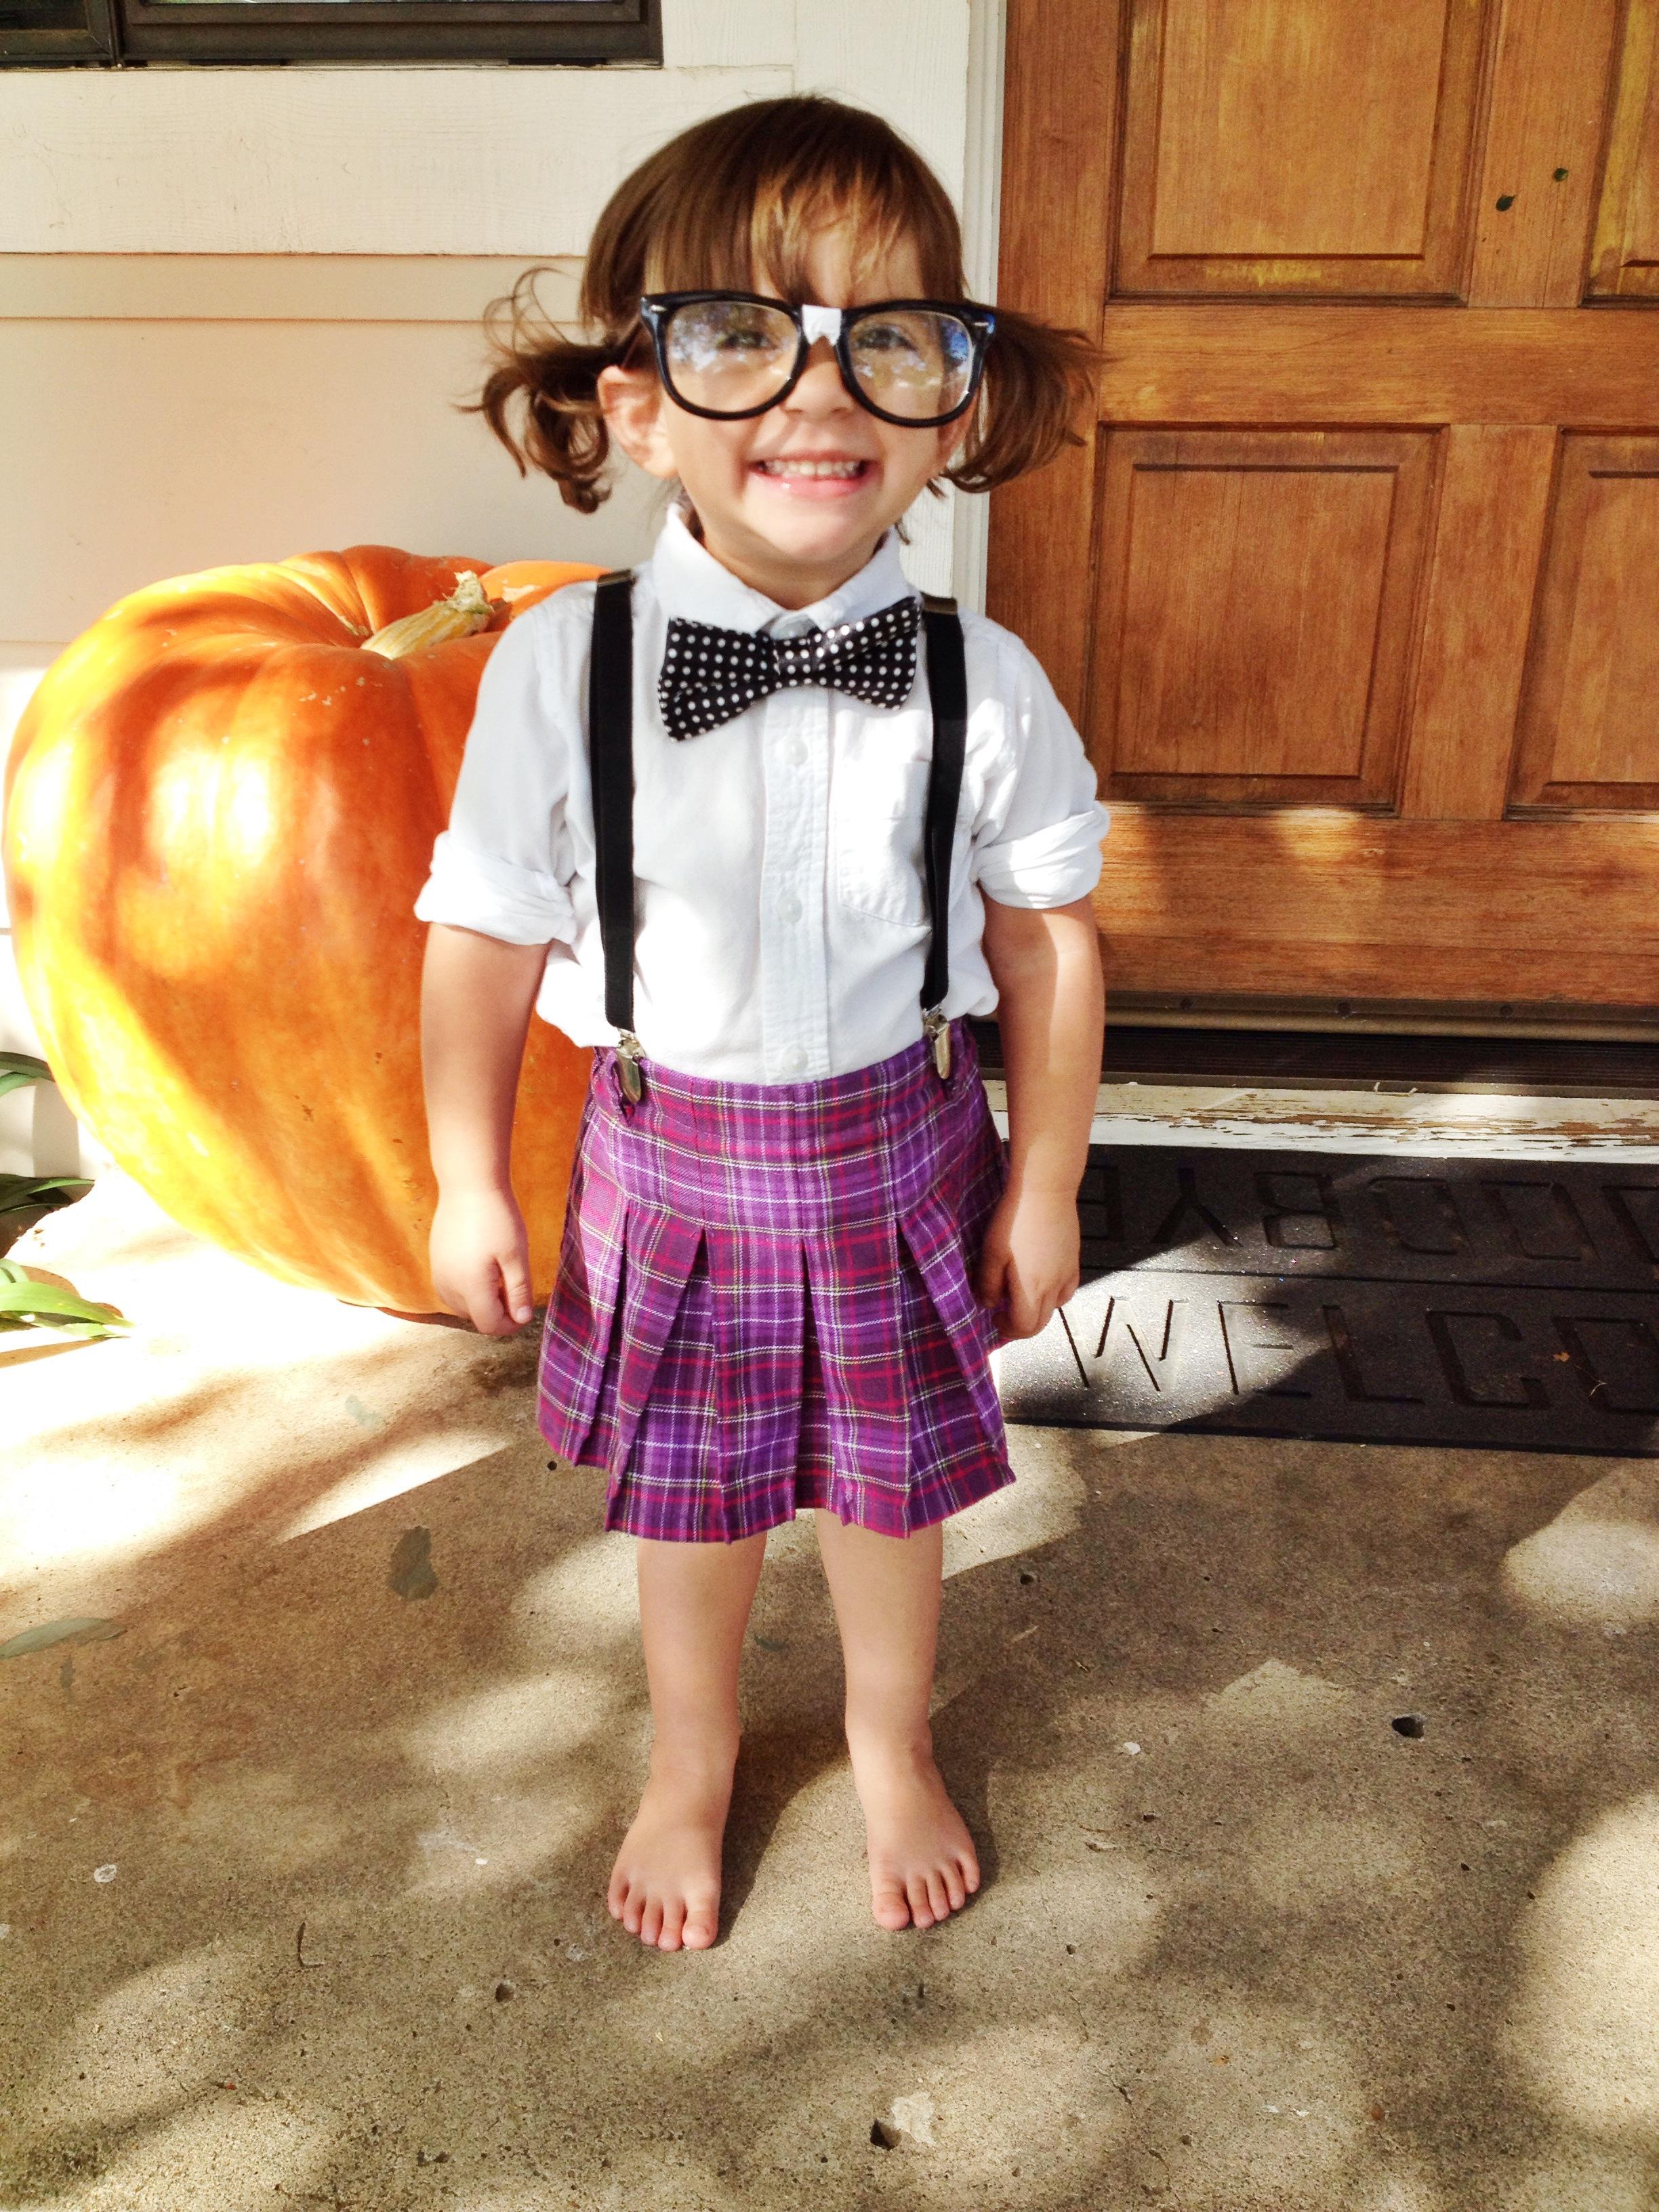 Easy, Inexpensive & Adorable DIY Halloween Costumes for Littles! {Nerd} | Lookie Boo